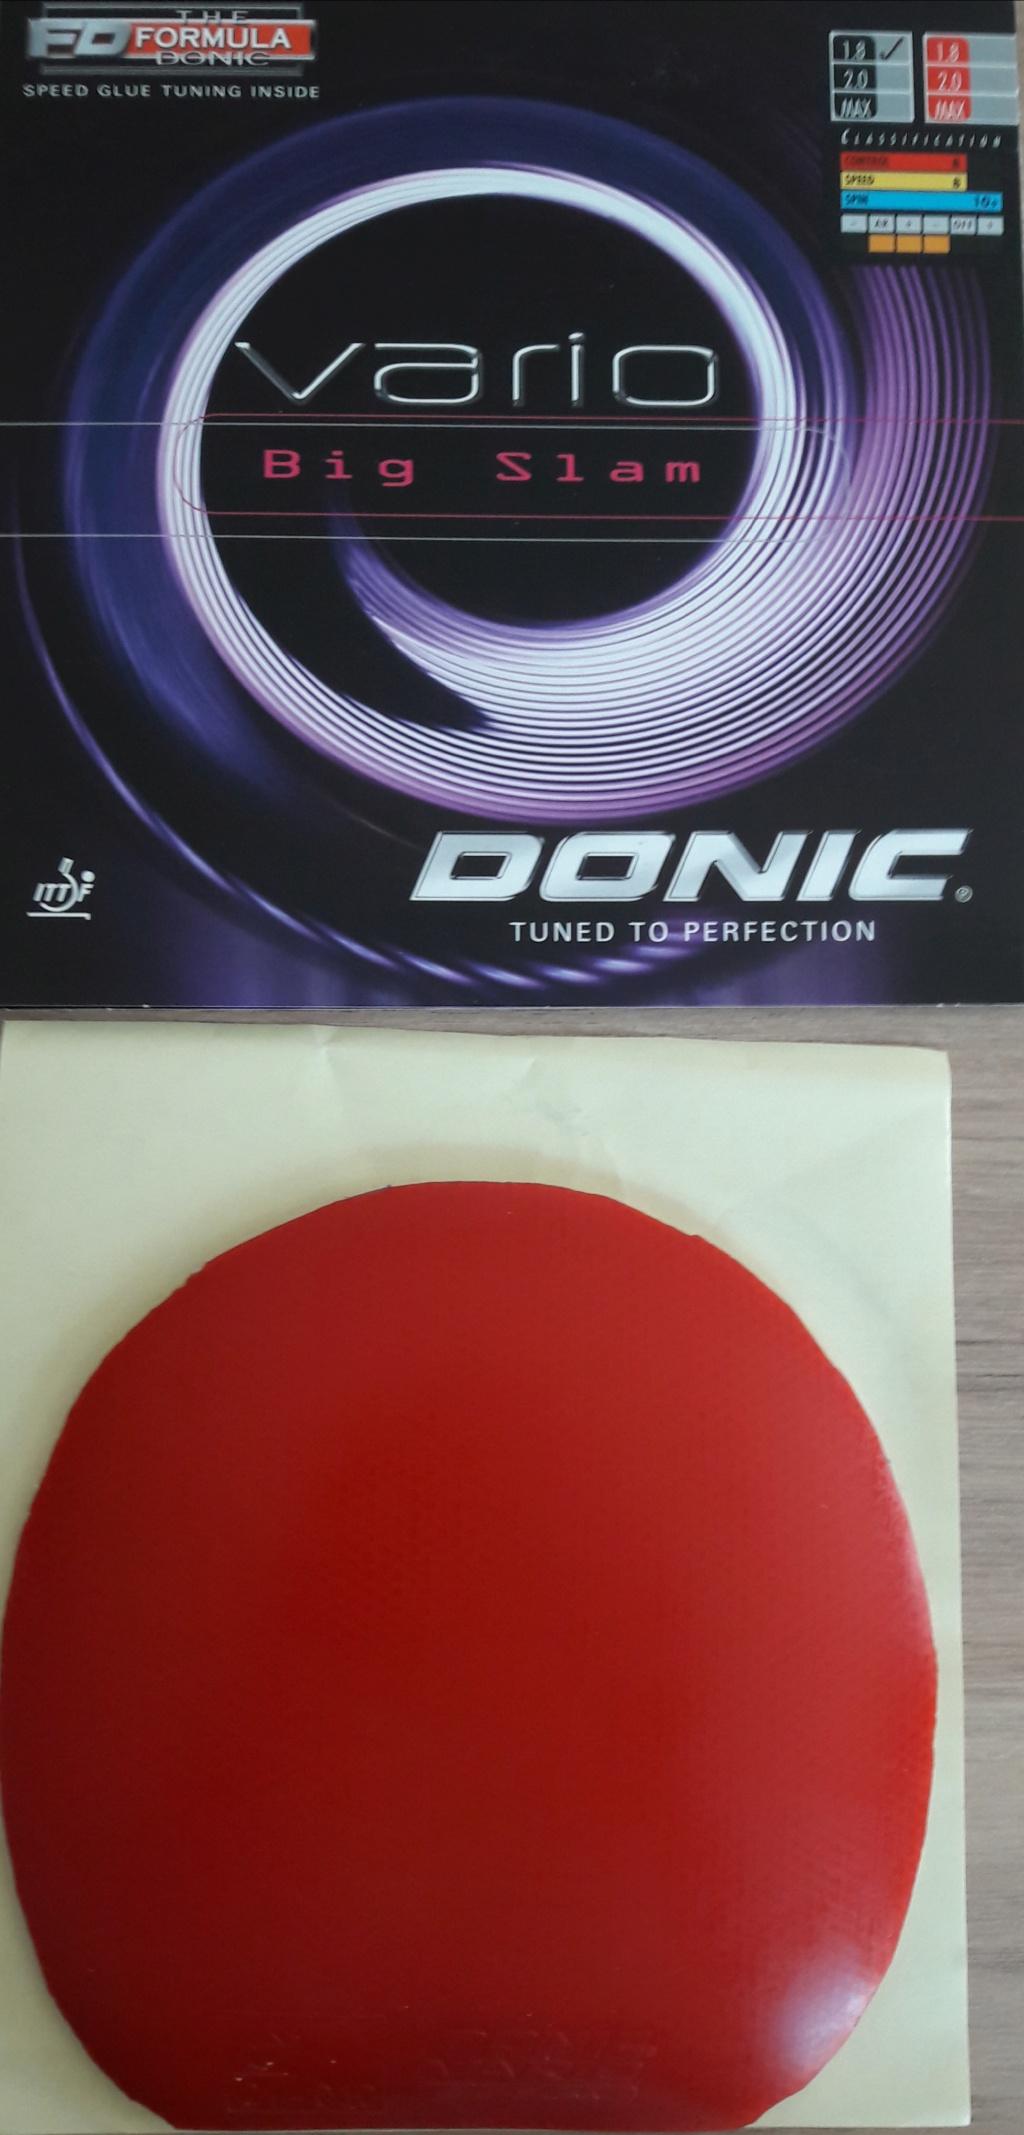 Donic Vario Bigslam rouge 1.8 mm X15.1*Y15.1 14 euros FDPI Variob10